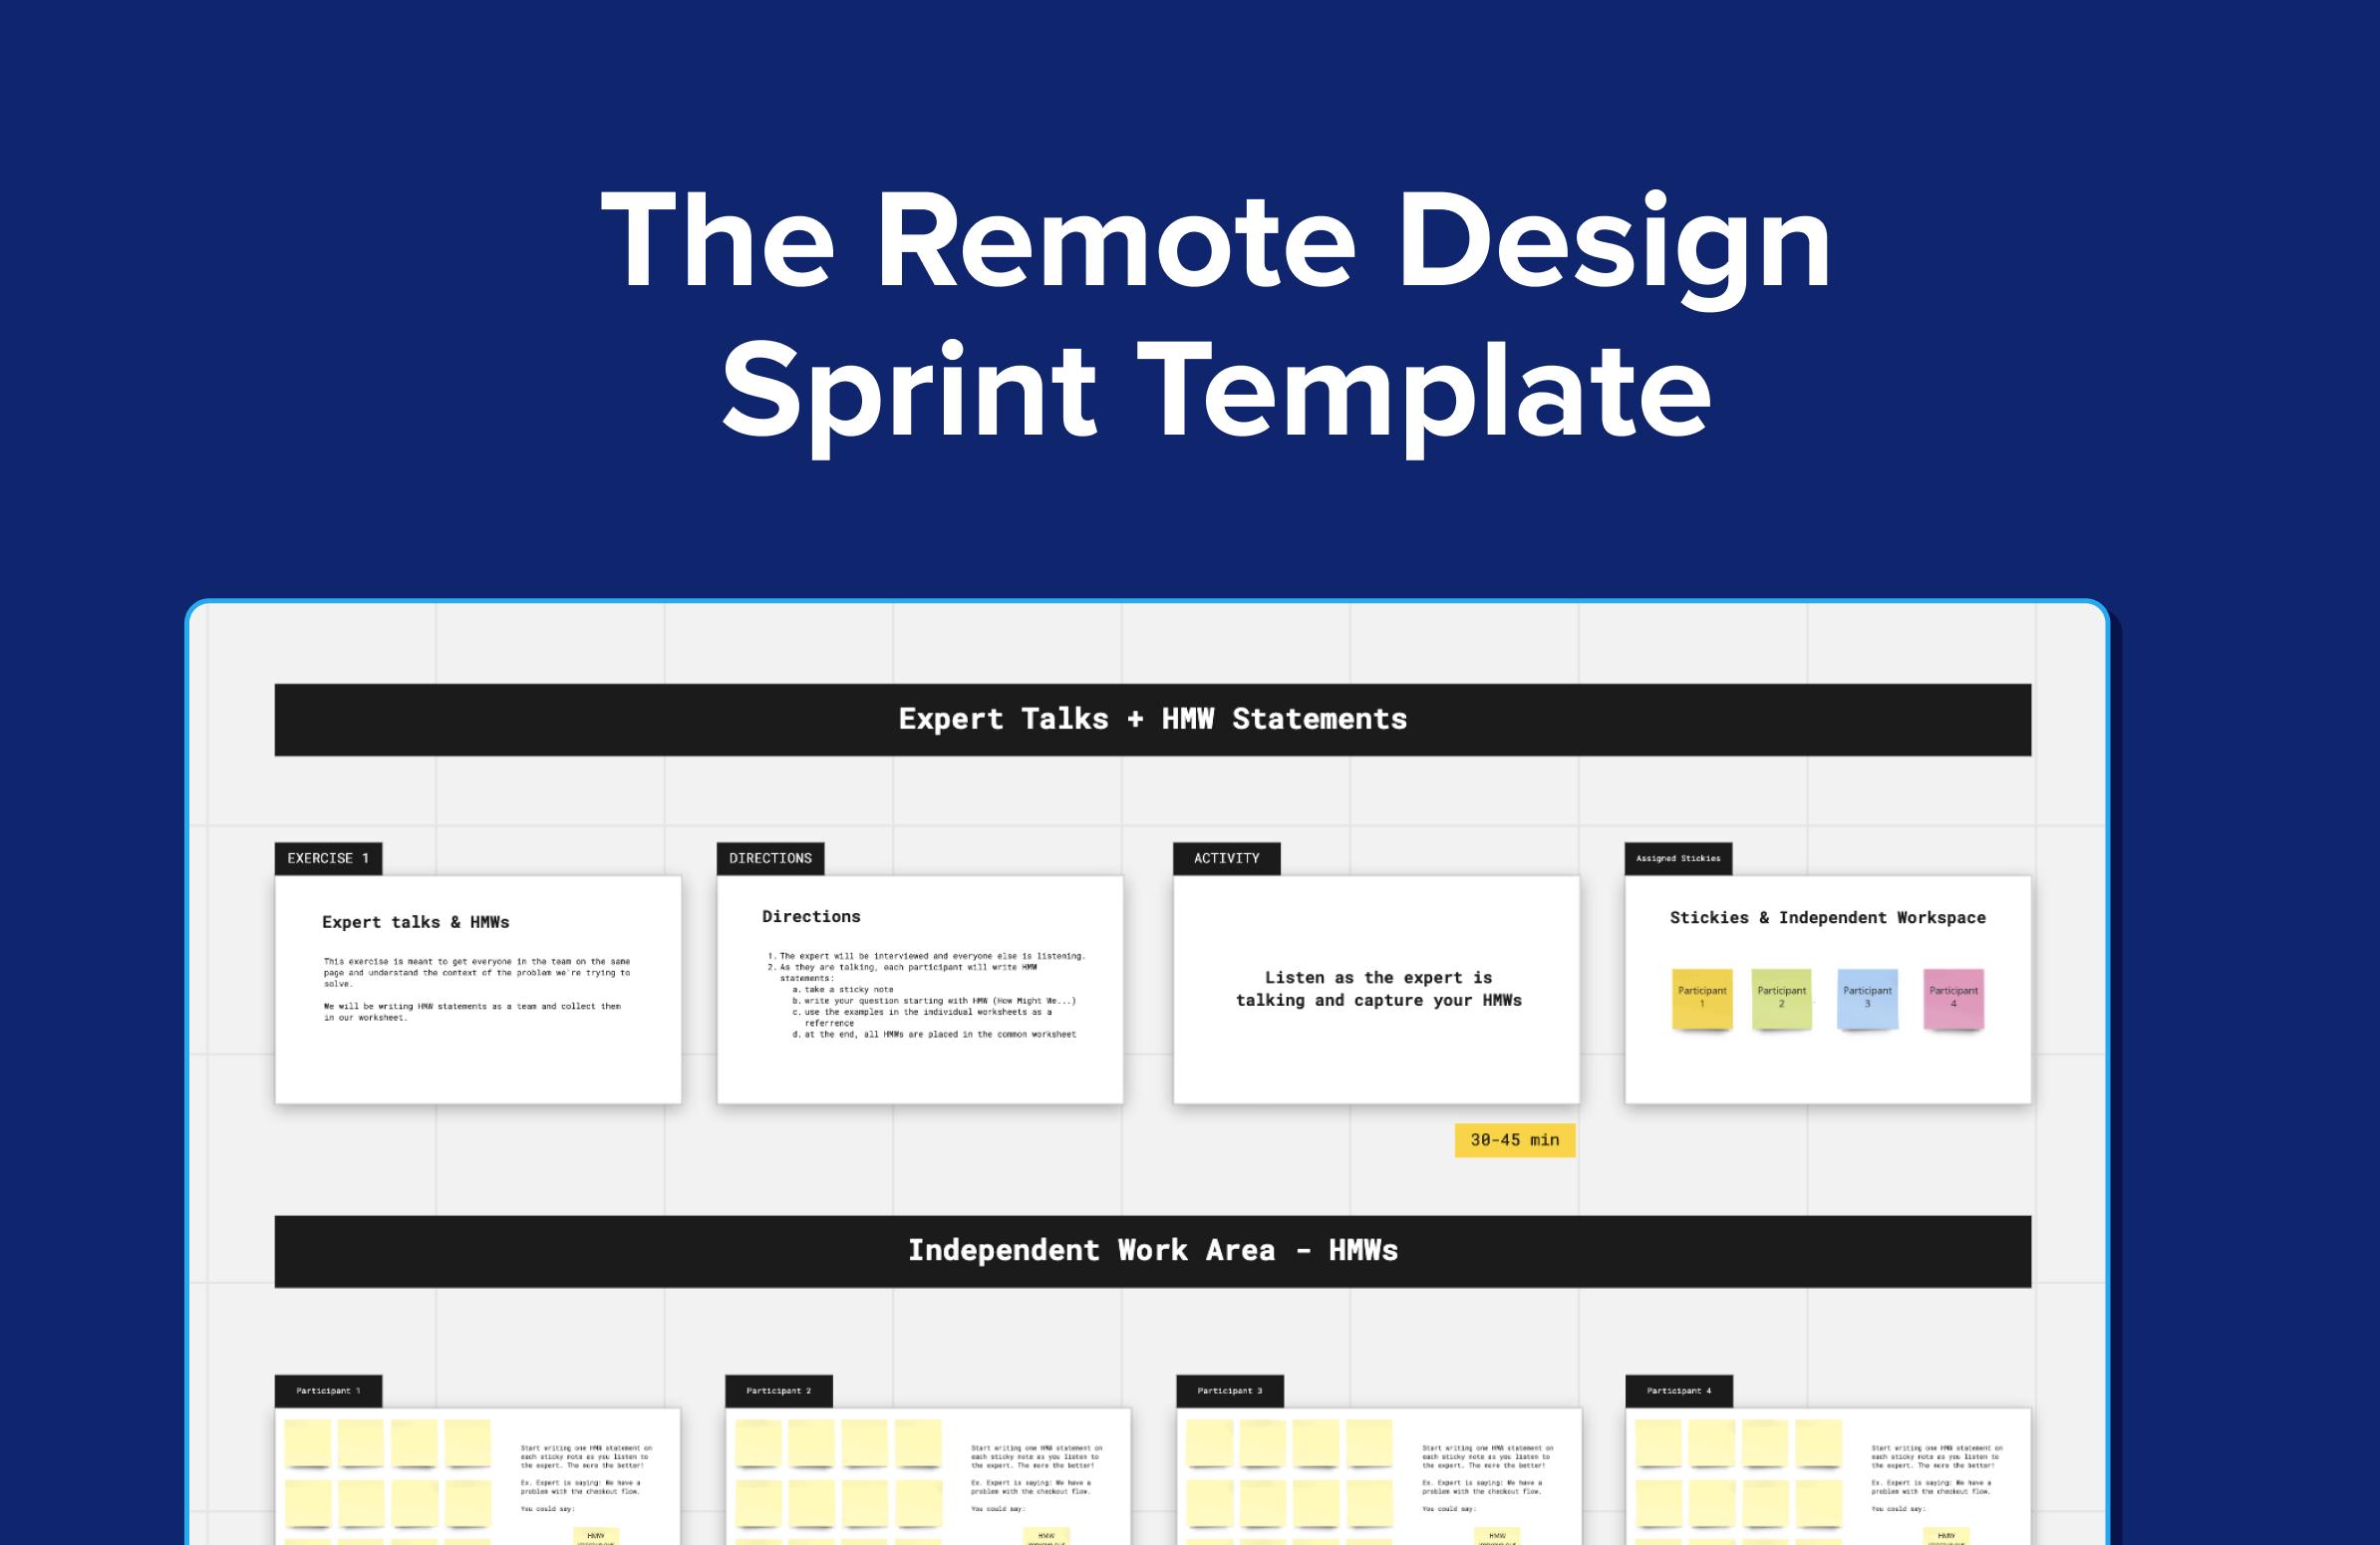 The remote design sprint template